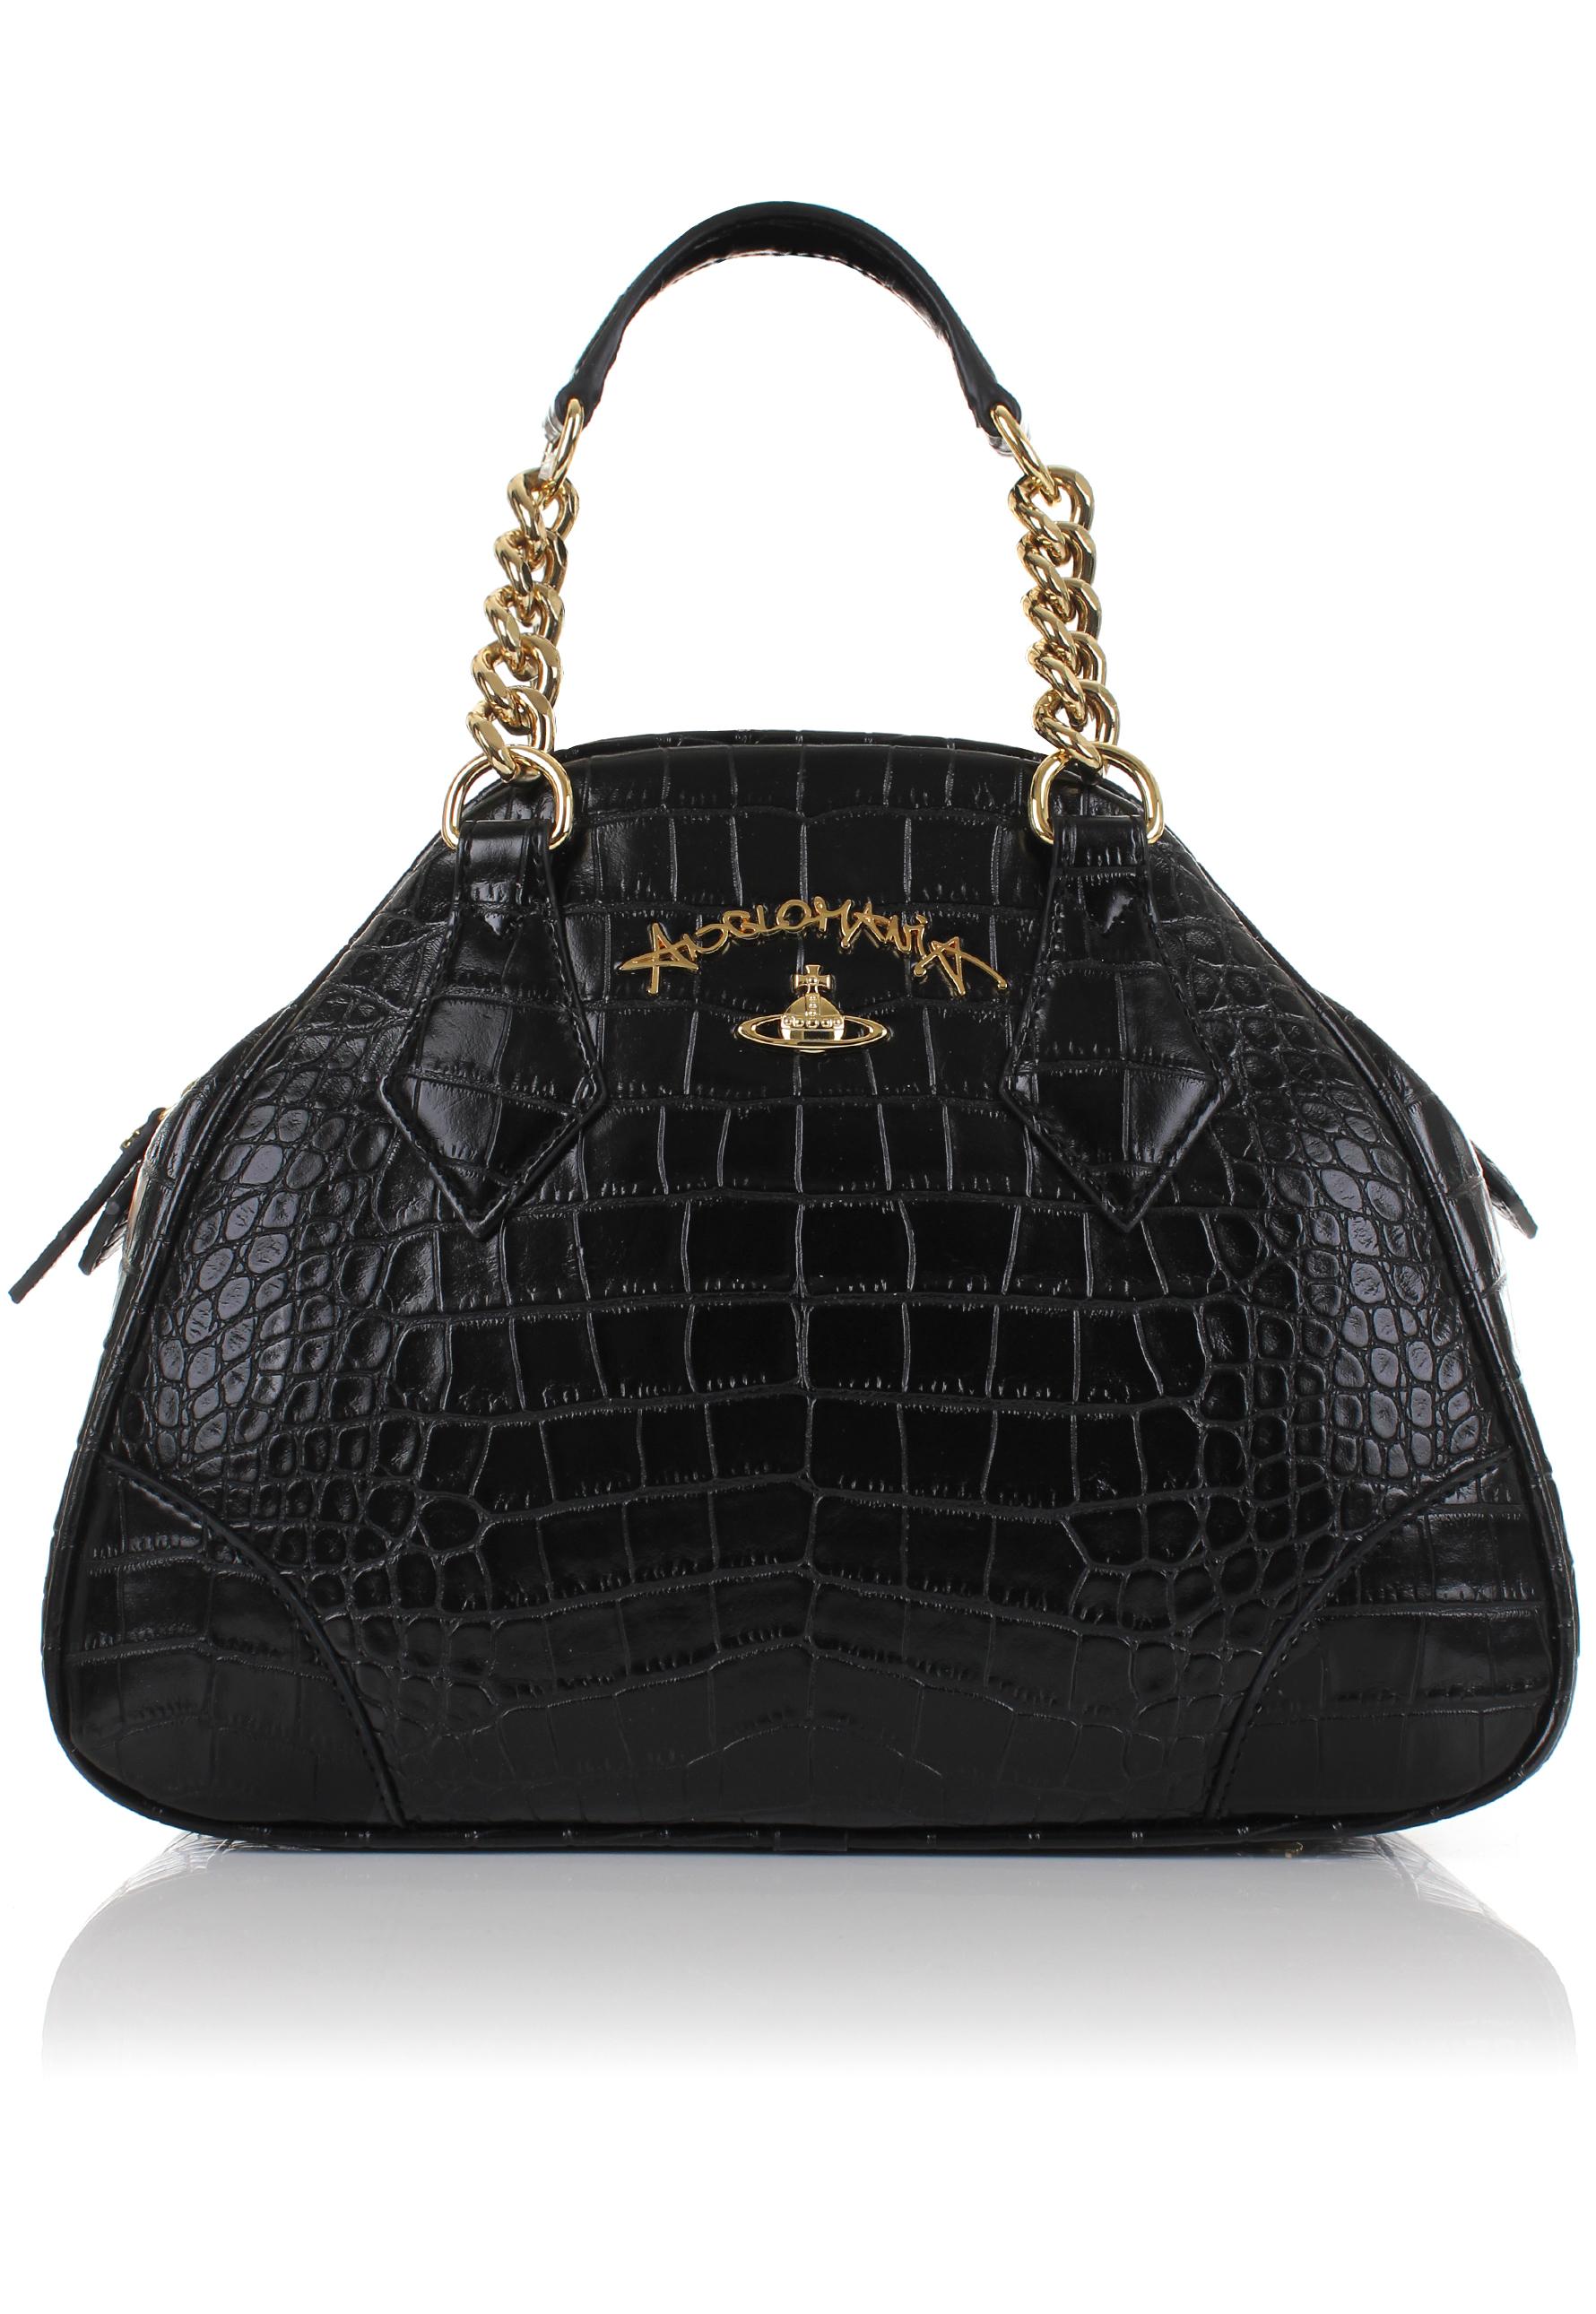 Lyst - Vivienne Westwood Dorset 7268 Small Chain Yasmine Bag Black ... ed7e3c125824d